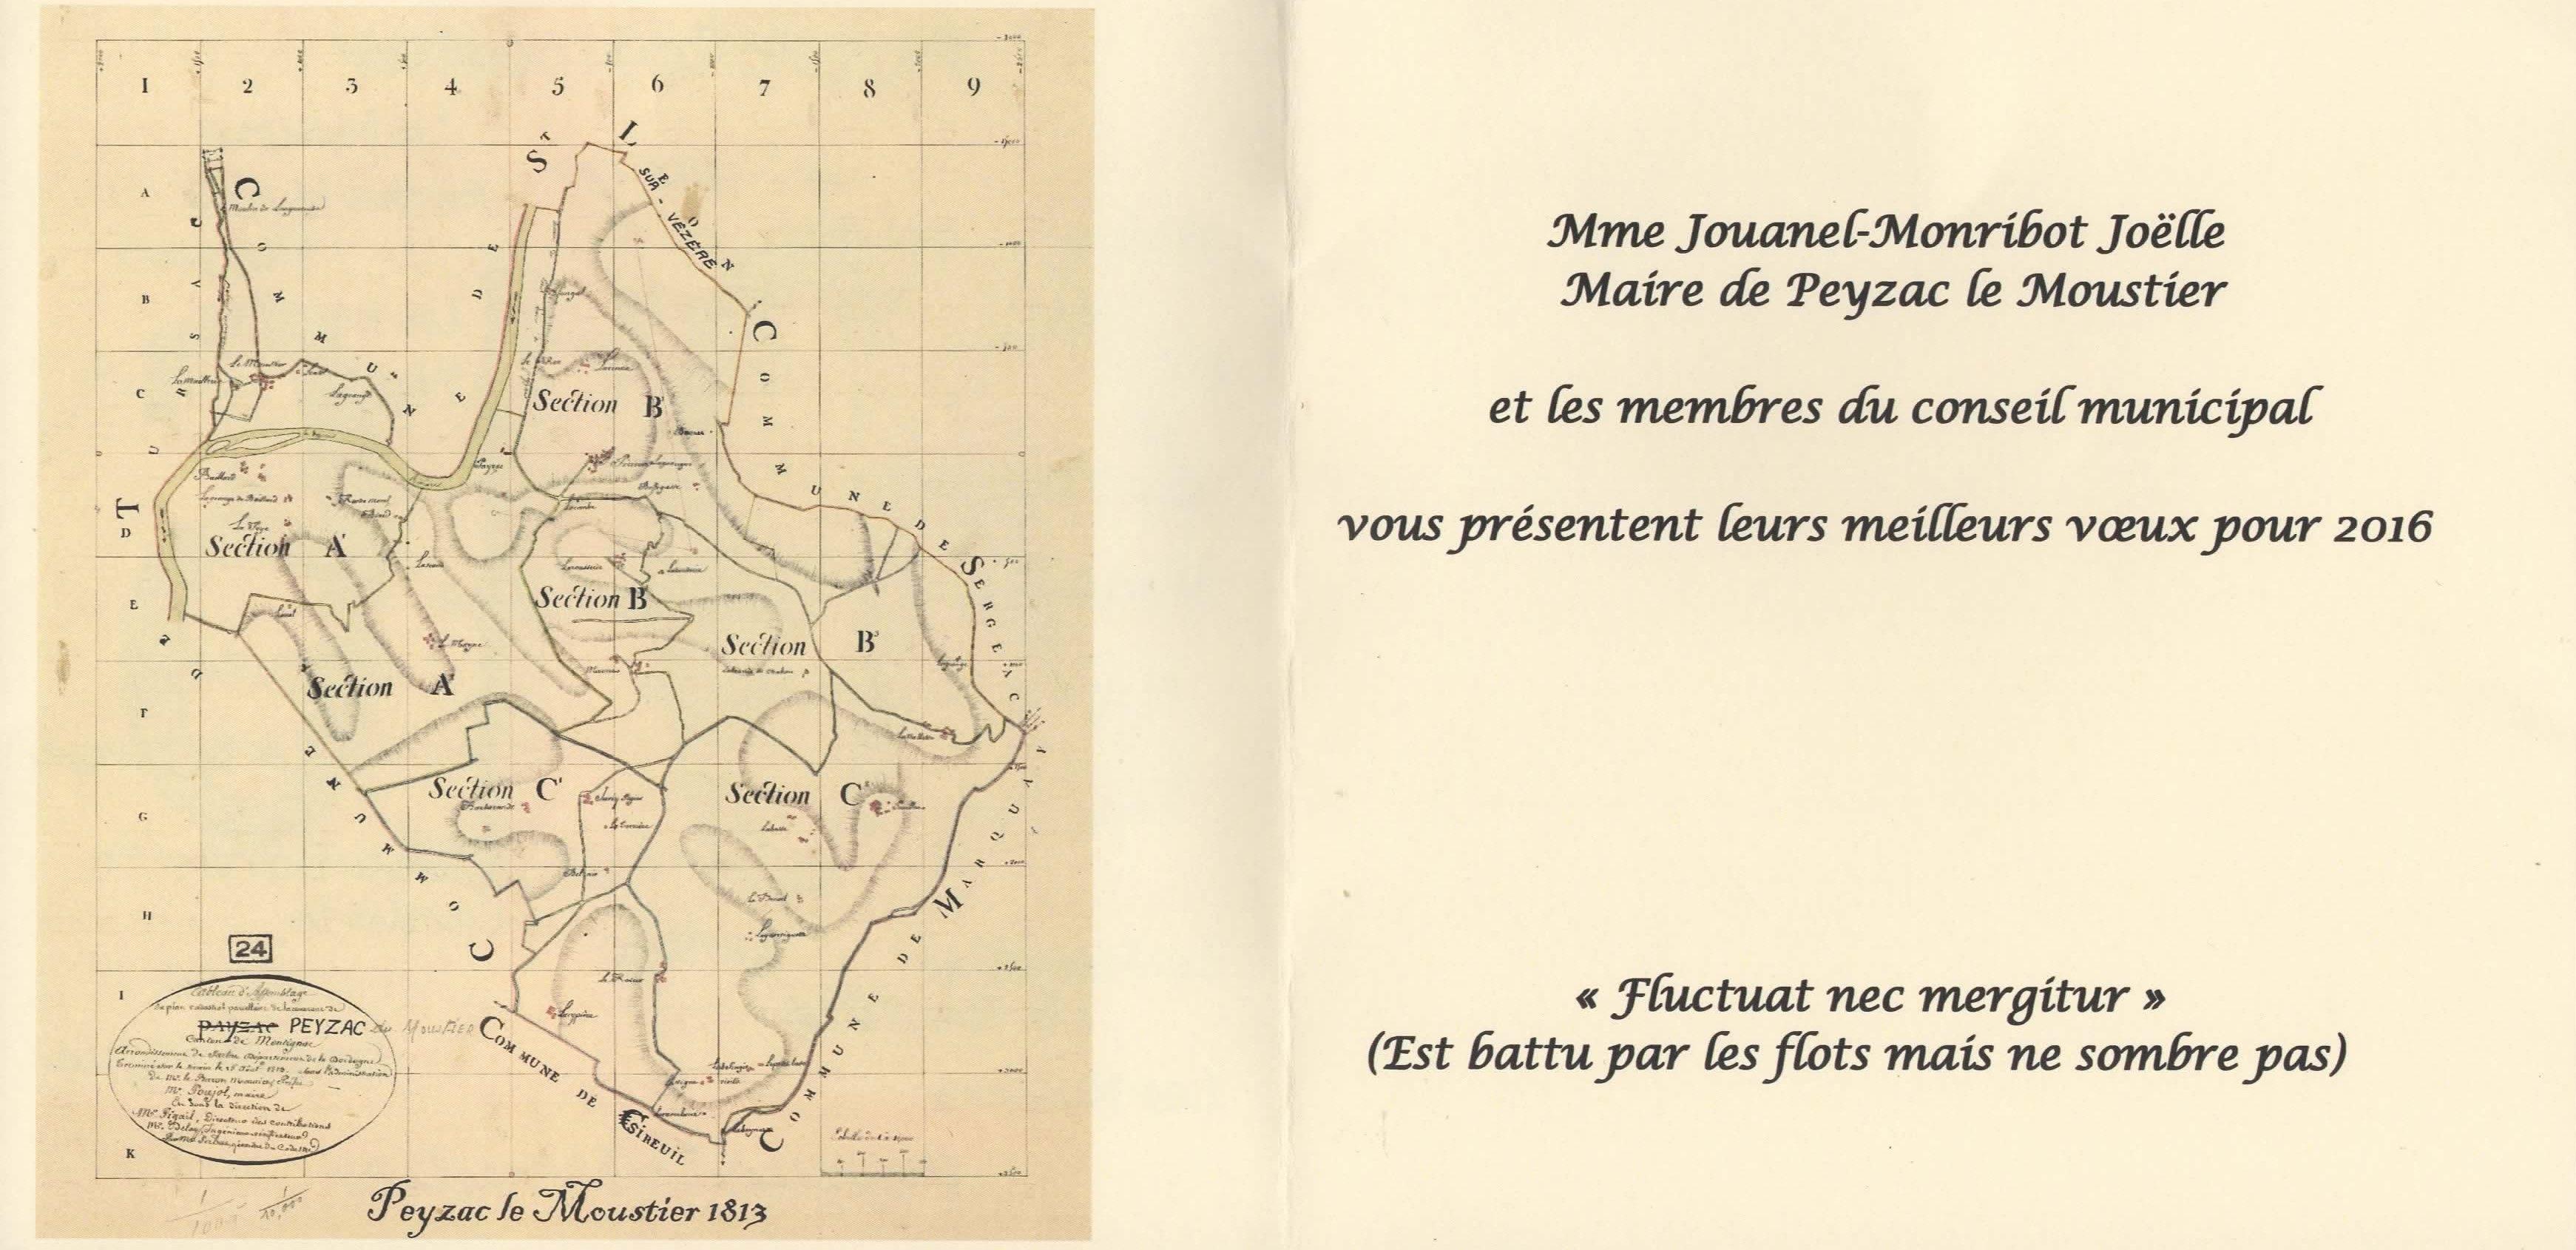 carte-voeux-2-001